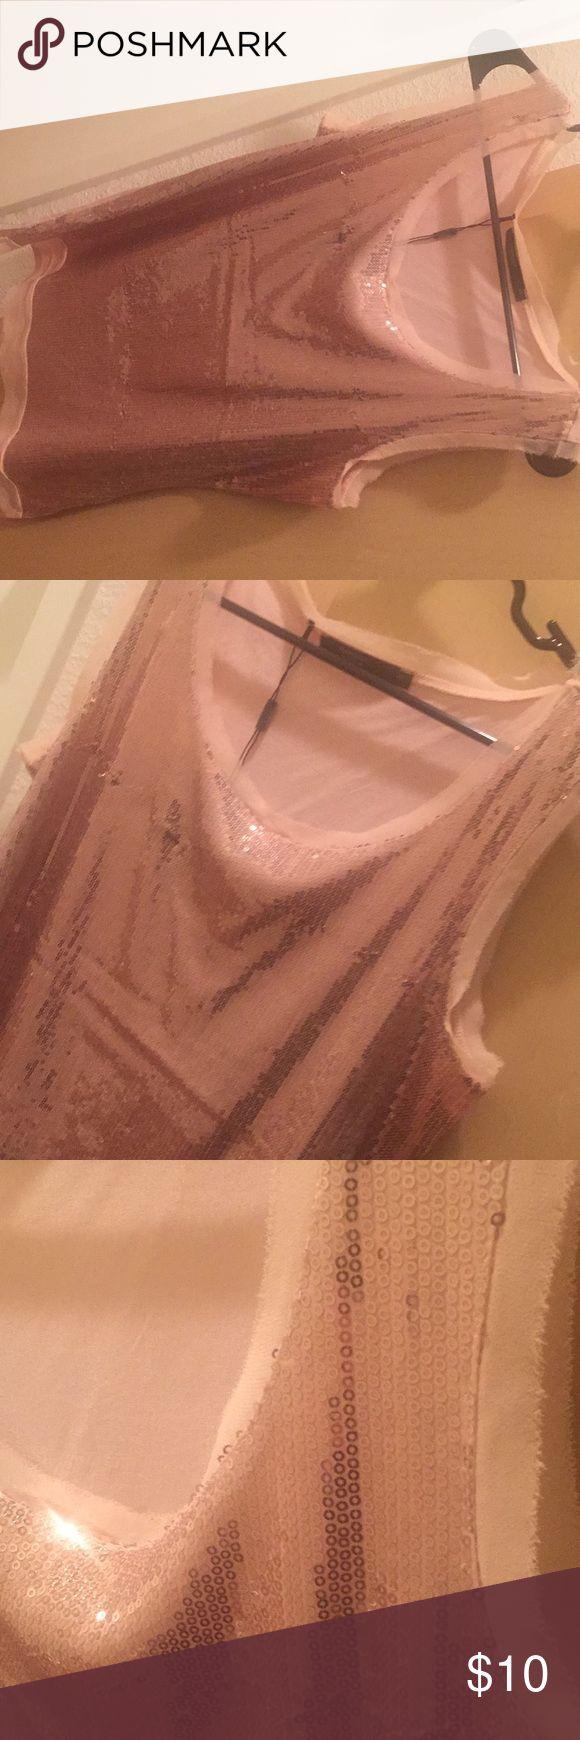 Top Glittery pink-peach color sleeveless top manguun Tops Tank Tops